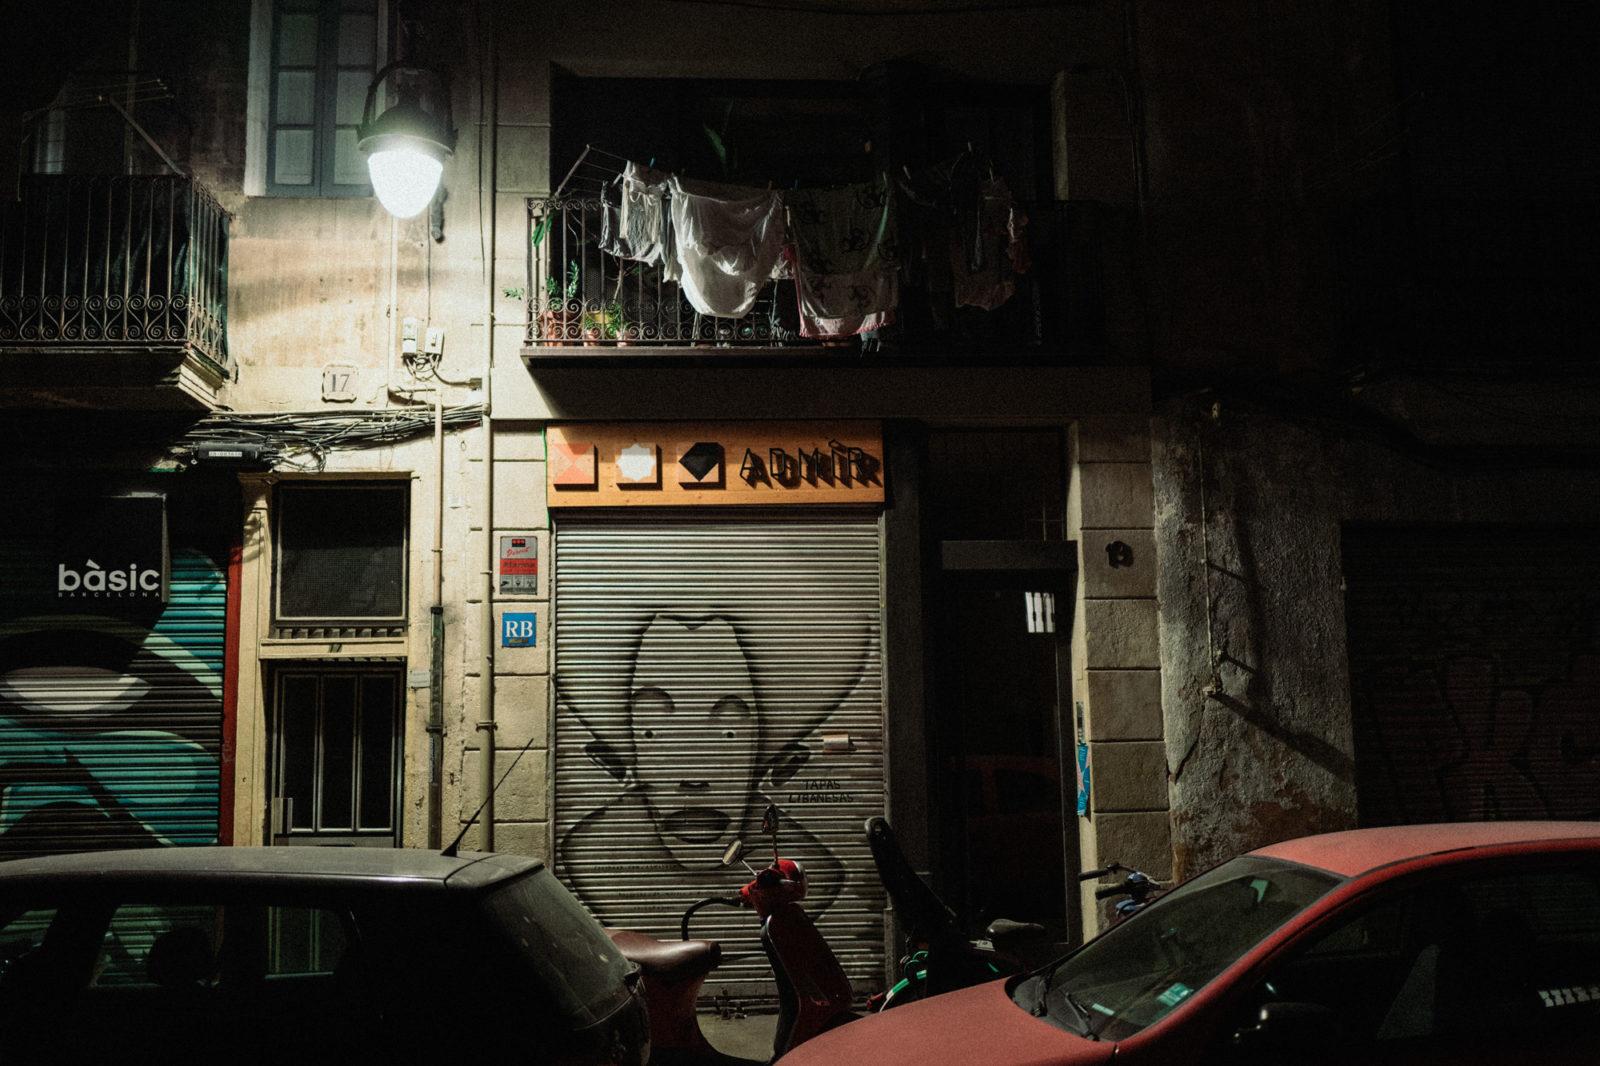 Barcelona Street-1090697